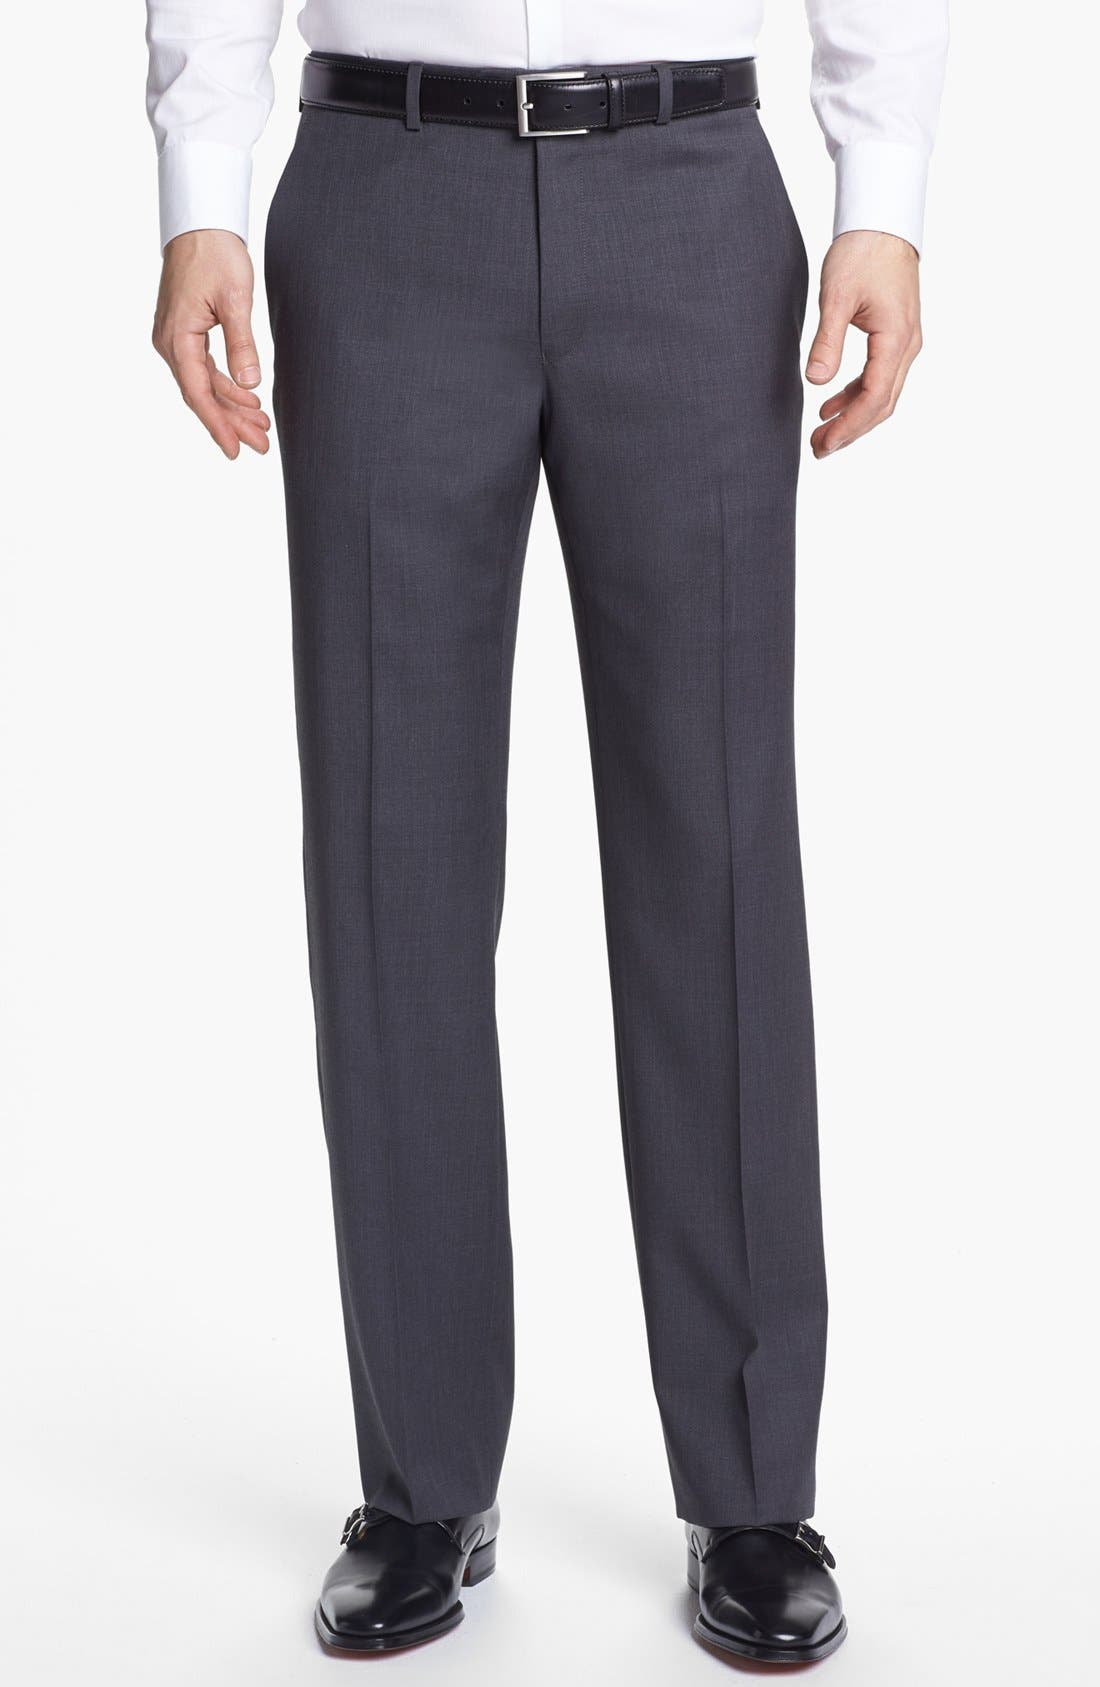 Main Image - John Varvatos 'Thompson' Trousers